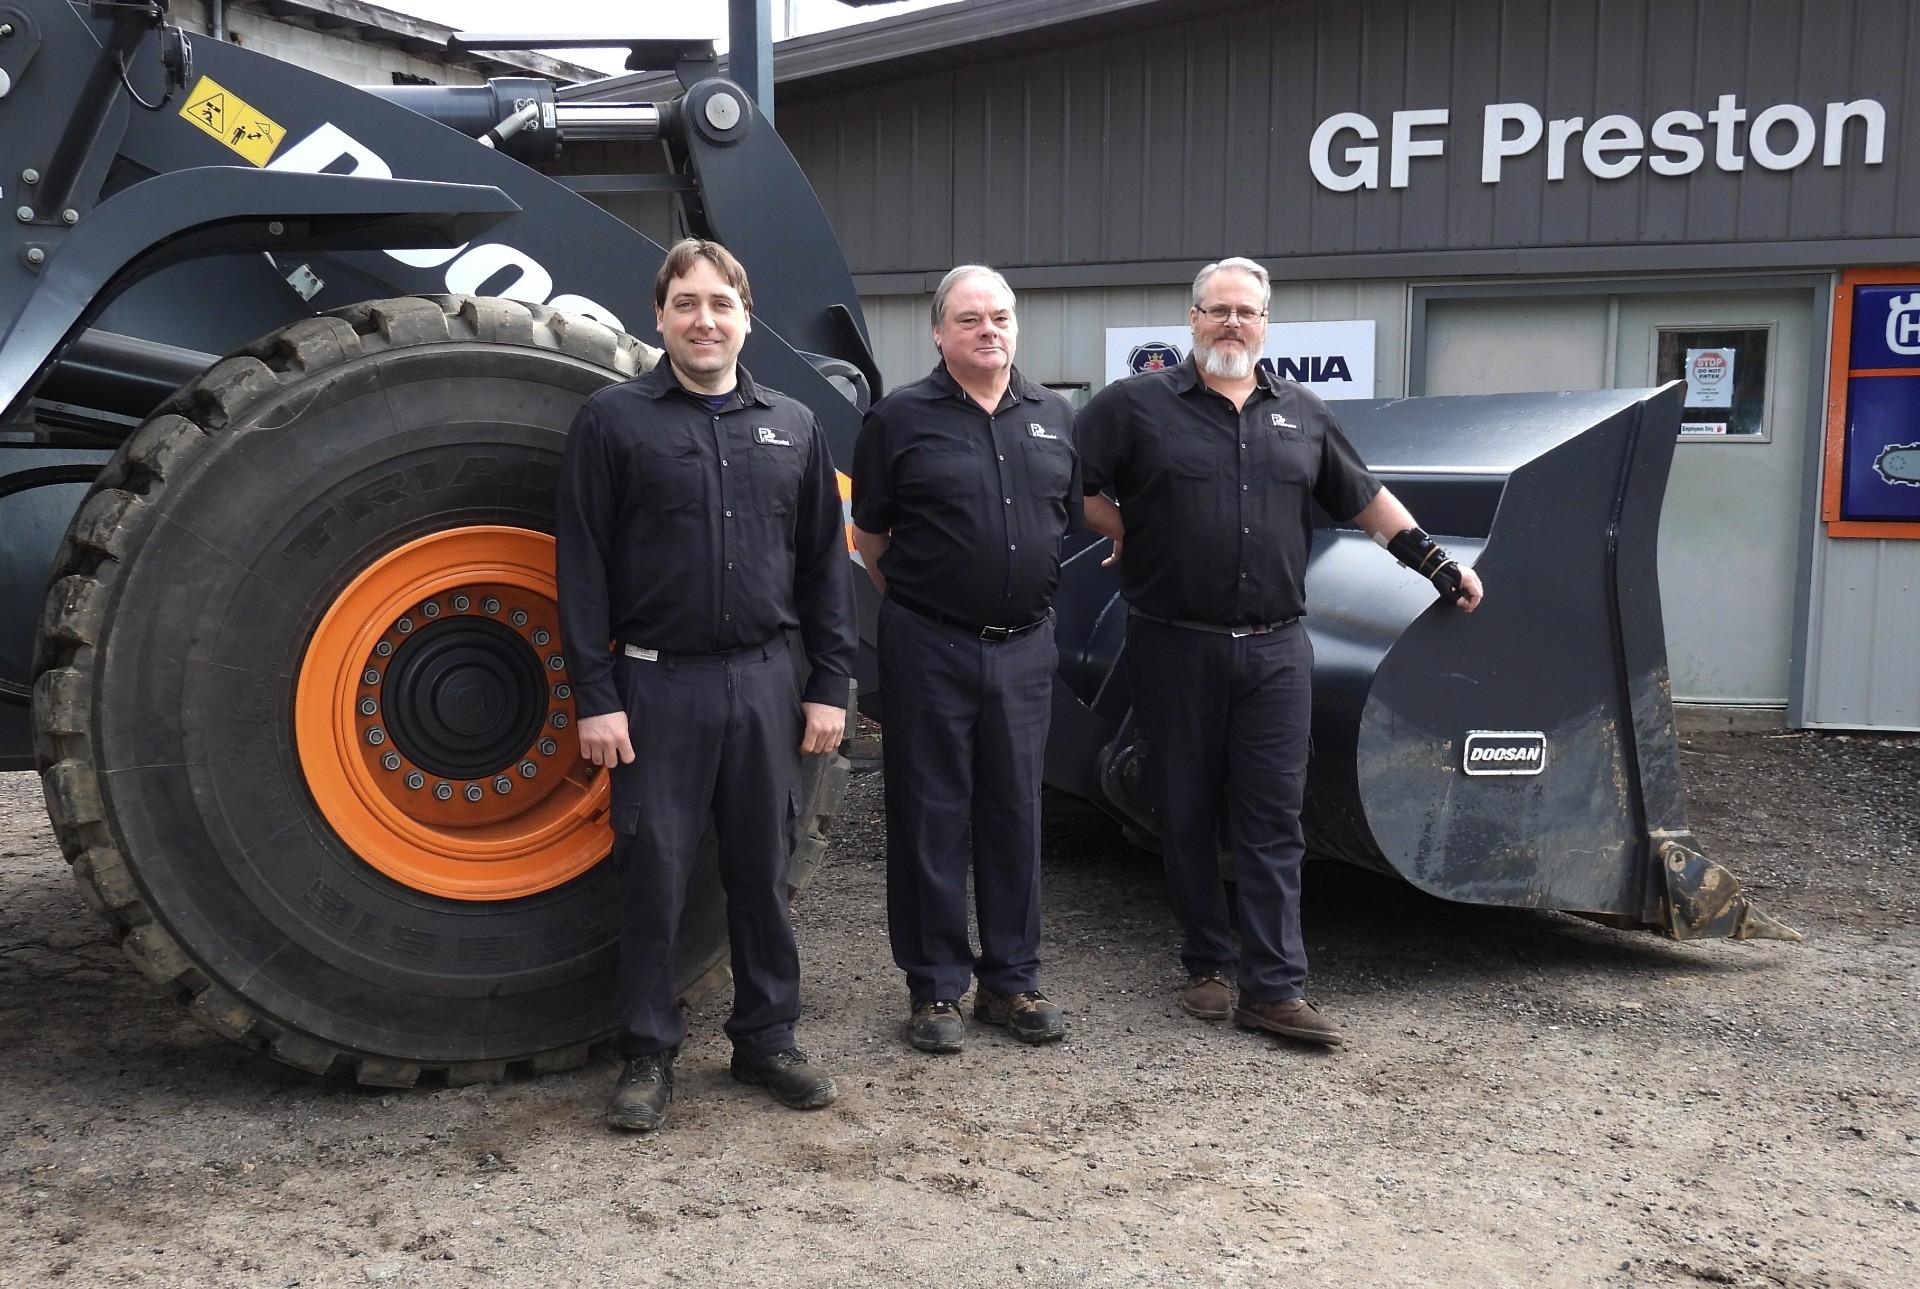 GF Preston Parts Associates Email – parts@gfpreston.com Number – (877) 245-2456